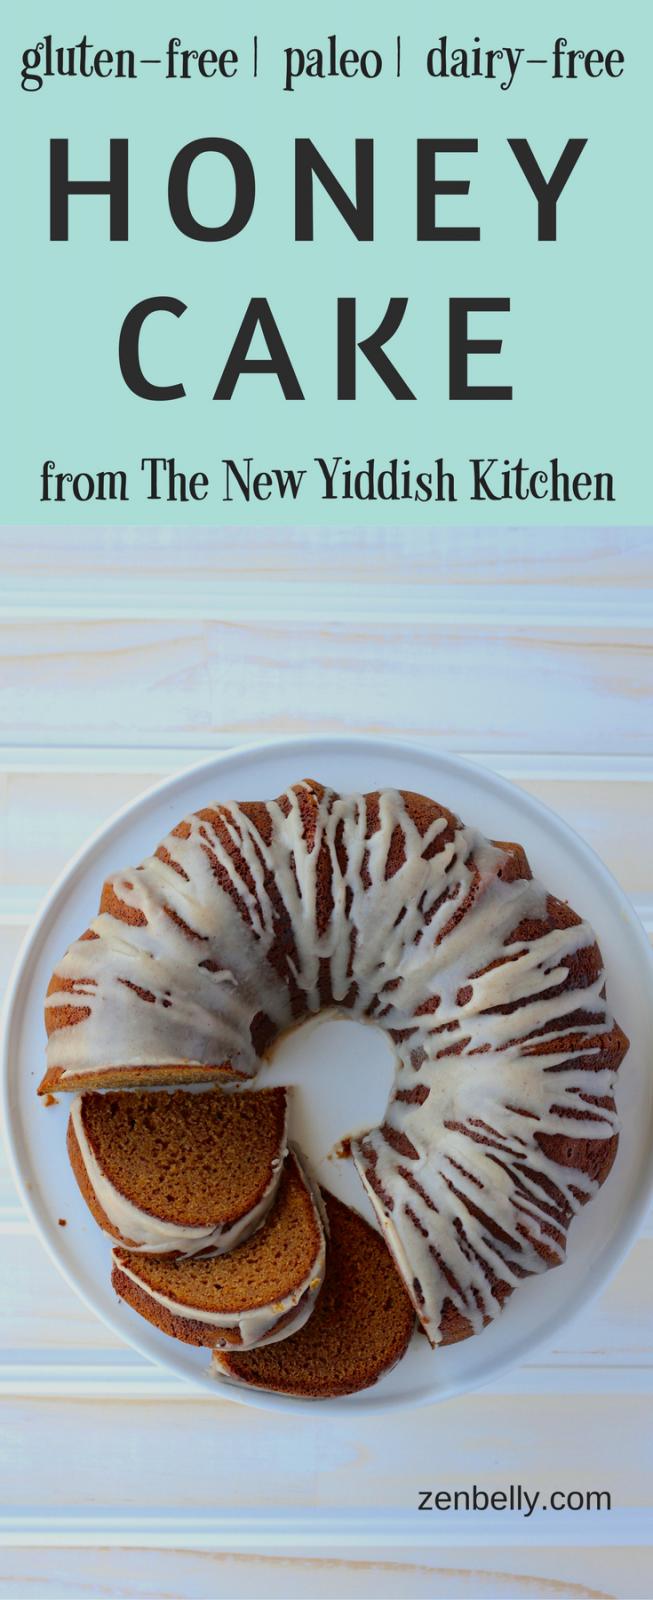 Honey Cake from The New Yiddish Kitchen - zenbelly